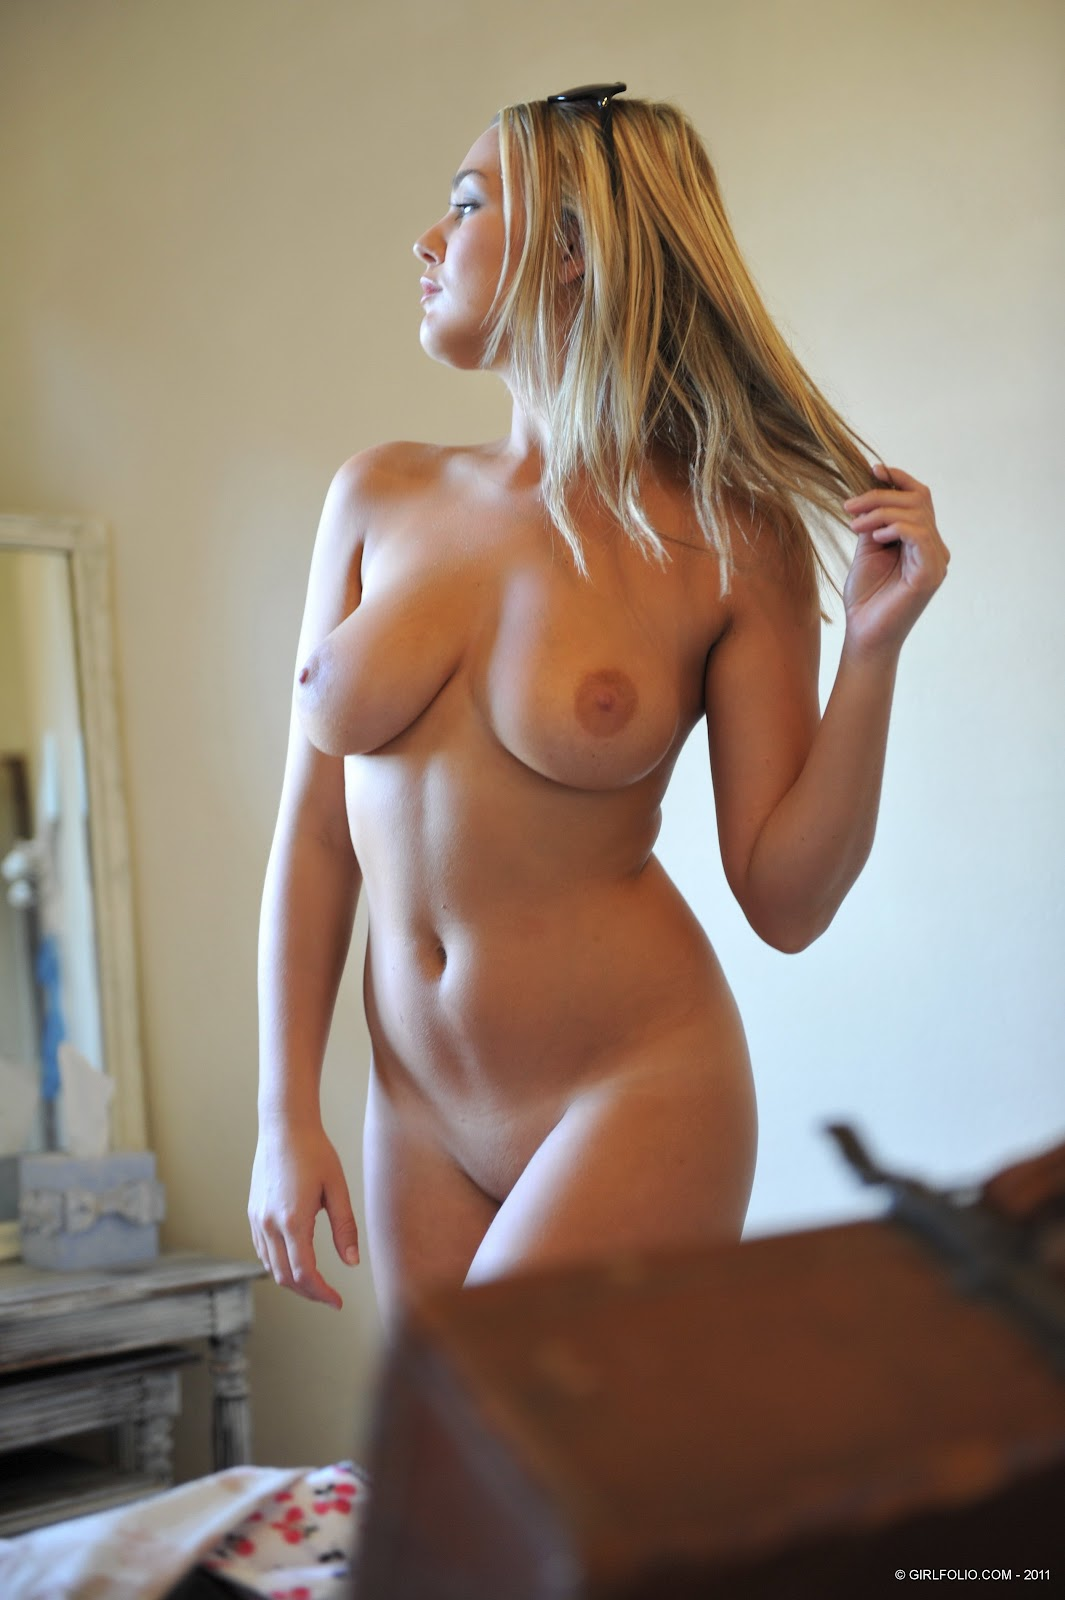 Full Nude Girl Photo